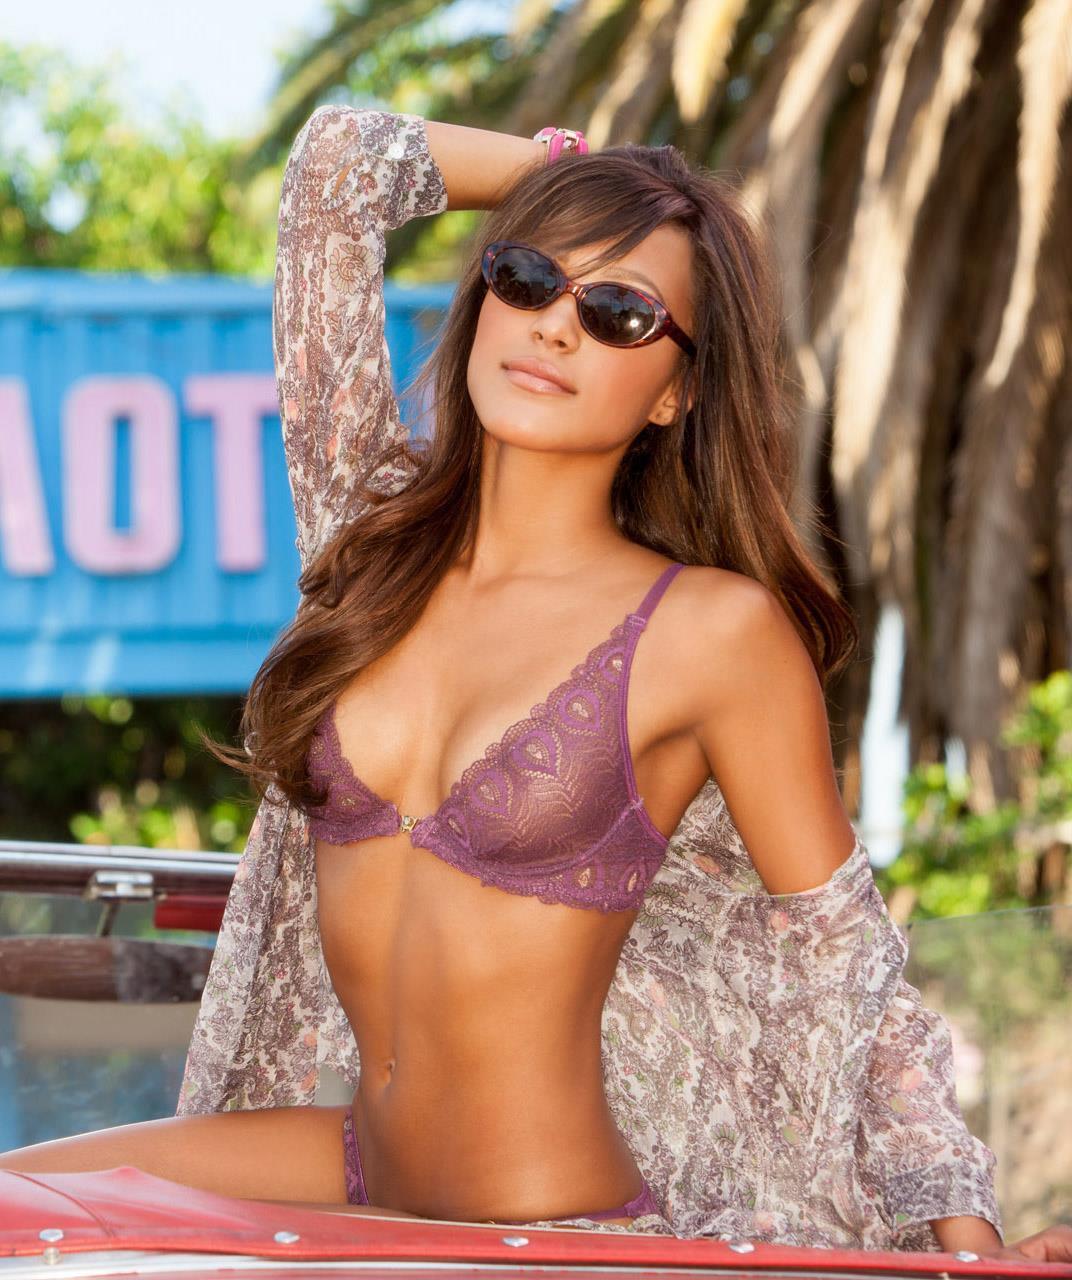 Jaslyn Ome in lingerie - breasts